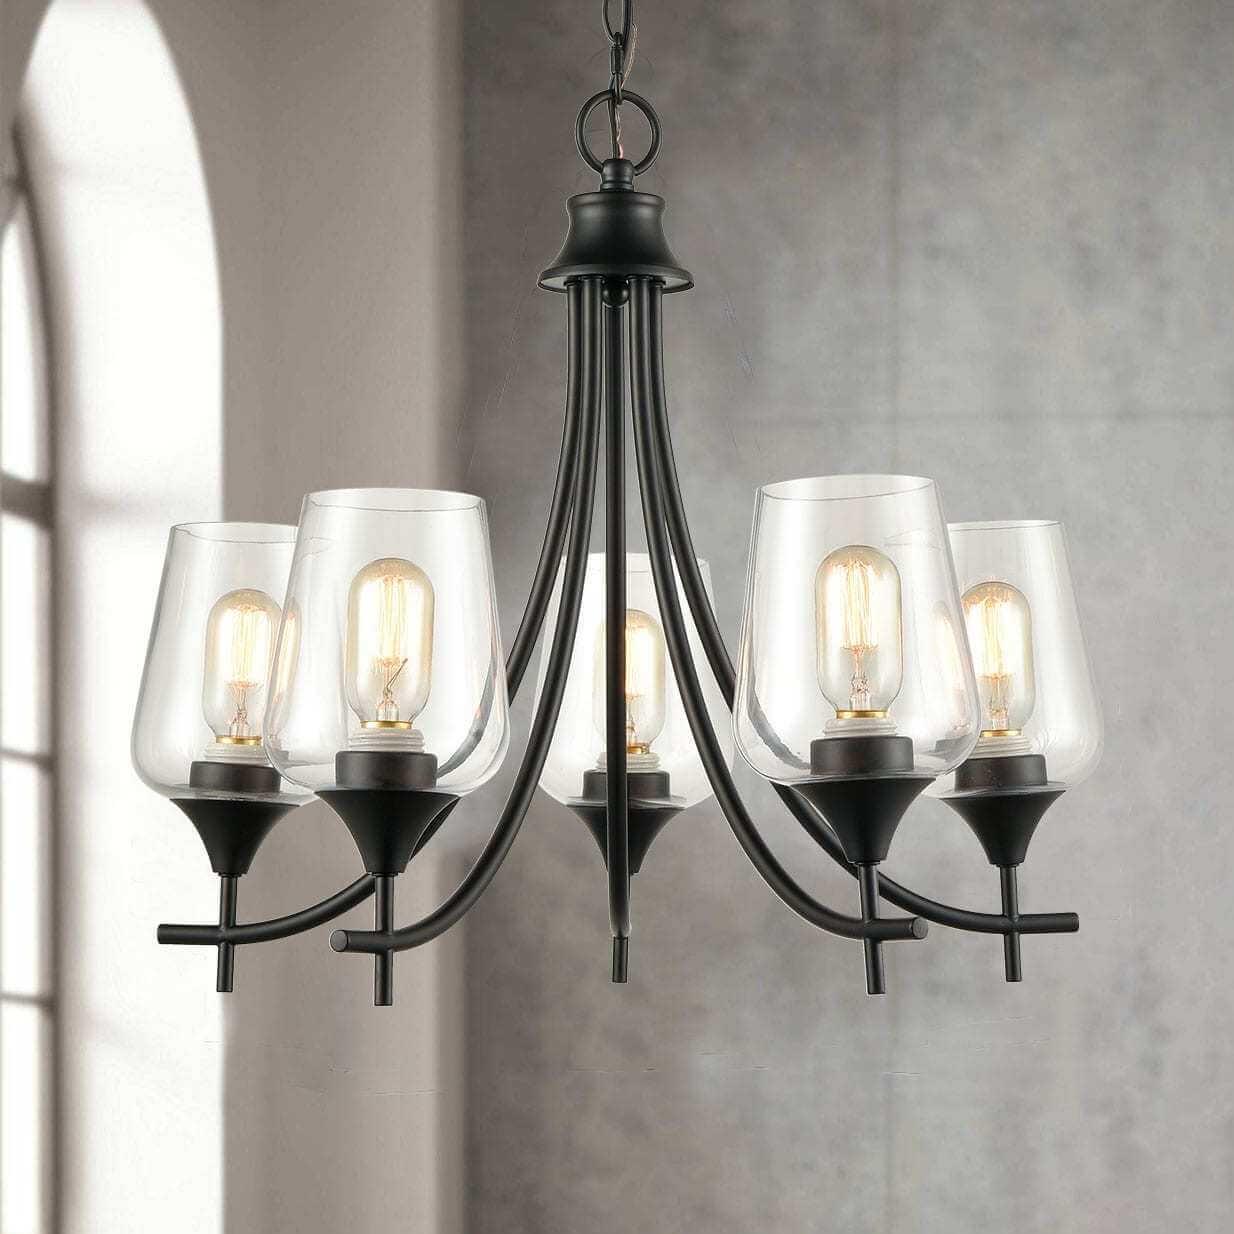 Modern Glass Semi-flush Mount Ceiling Light With Oil Rubbed Bronze